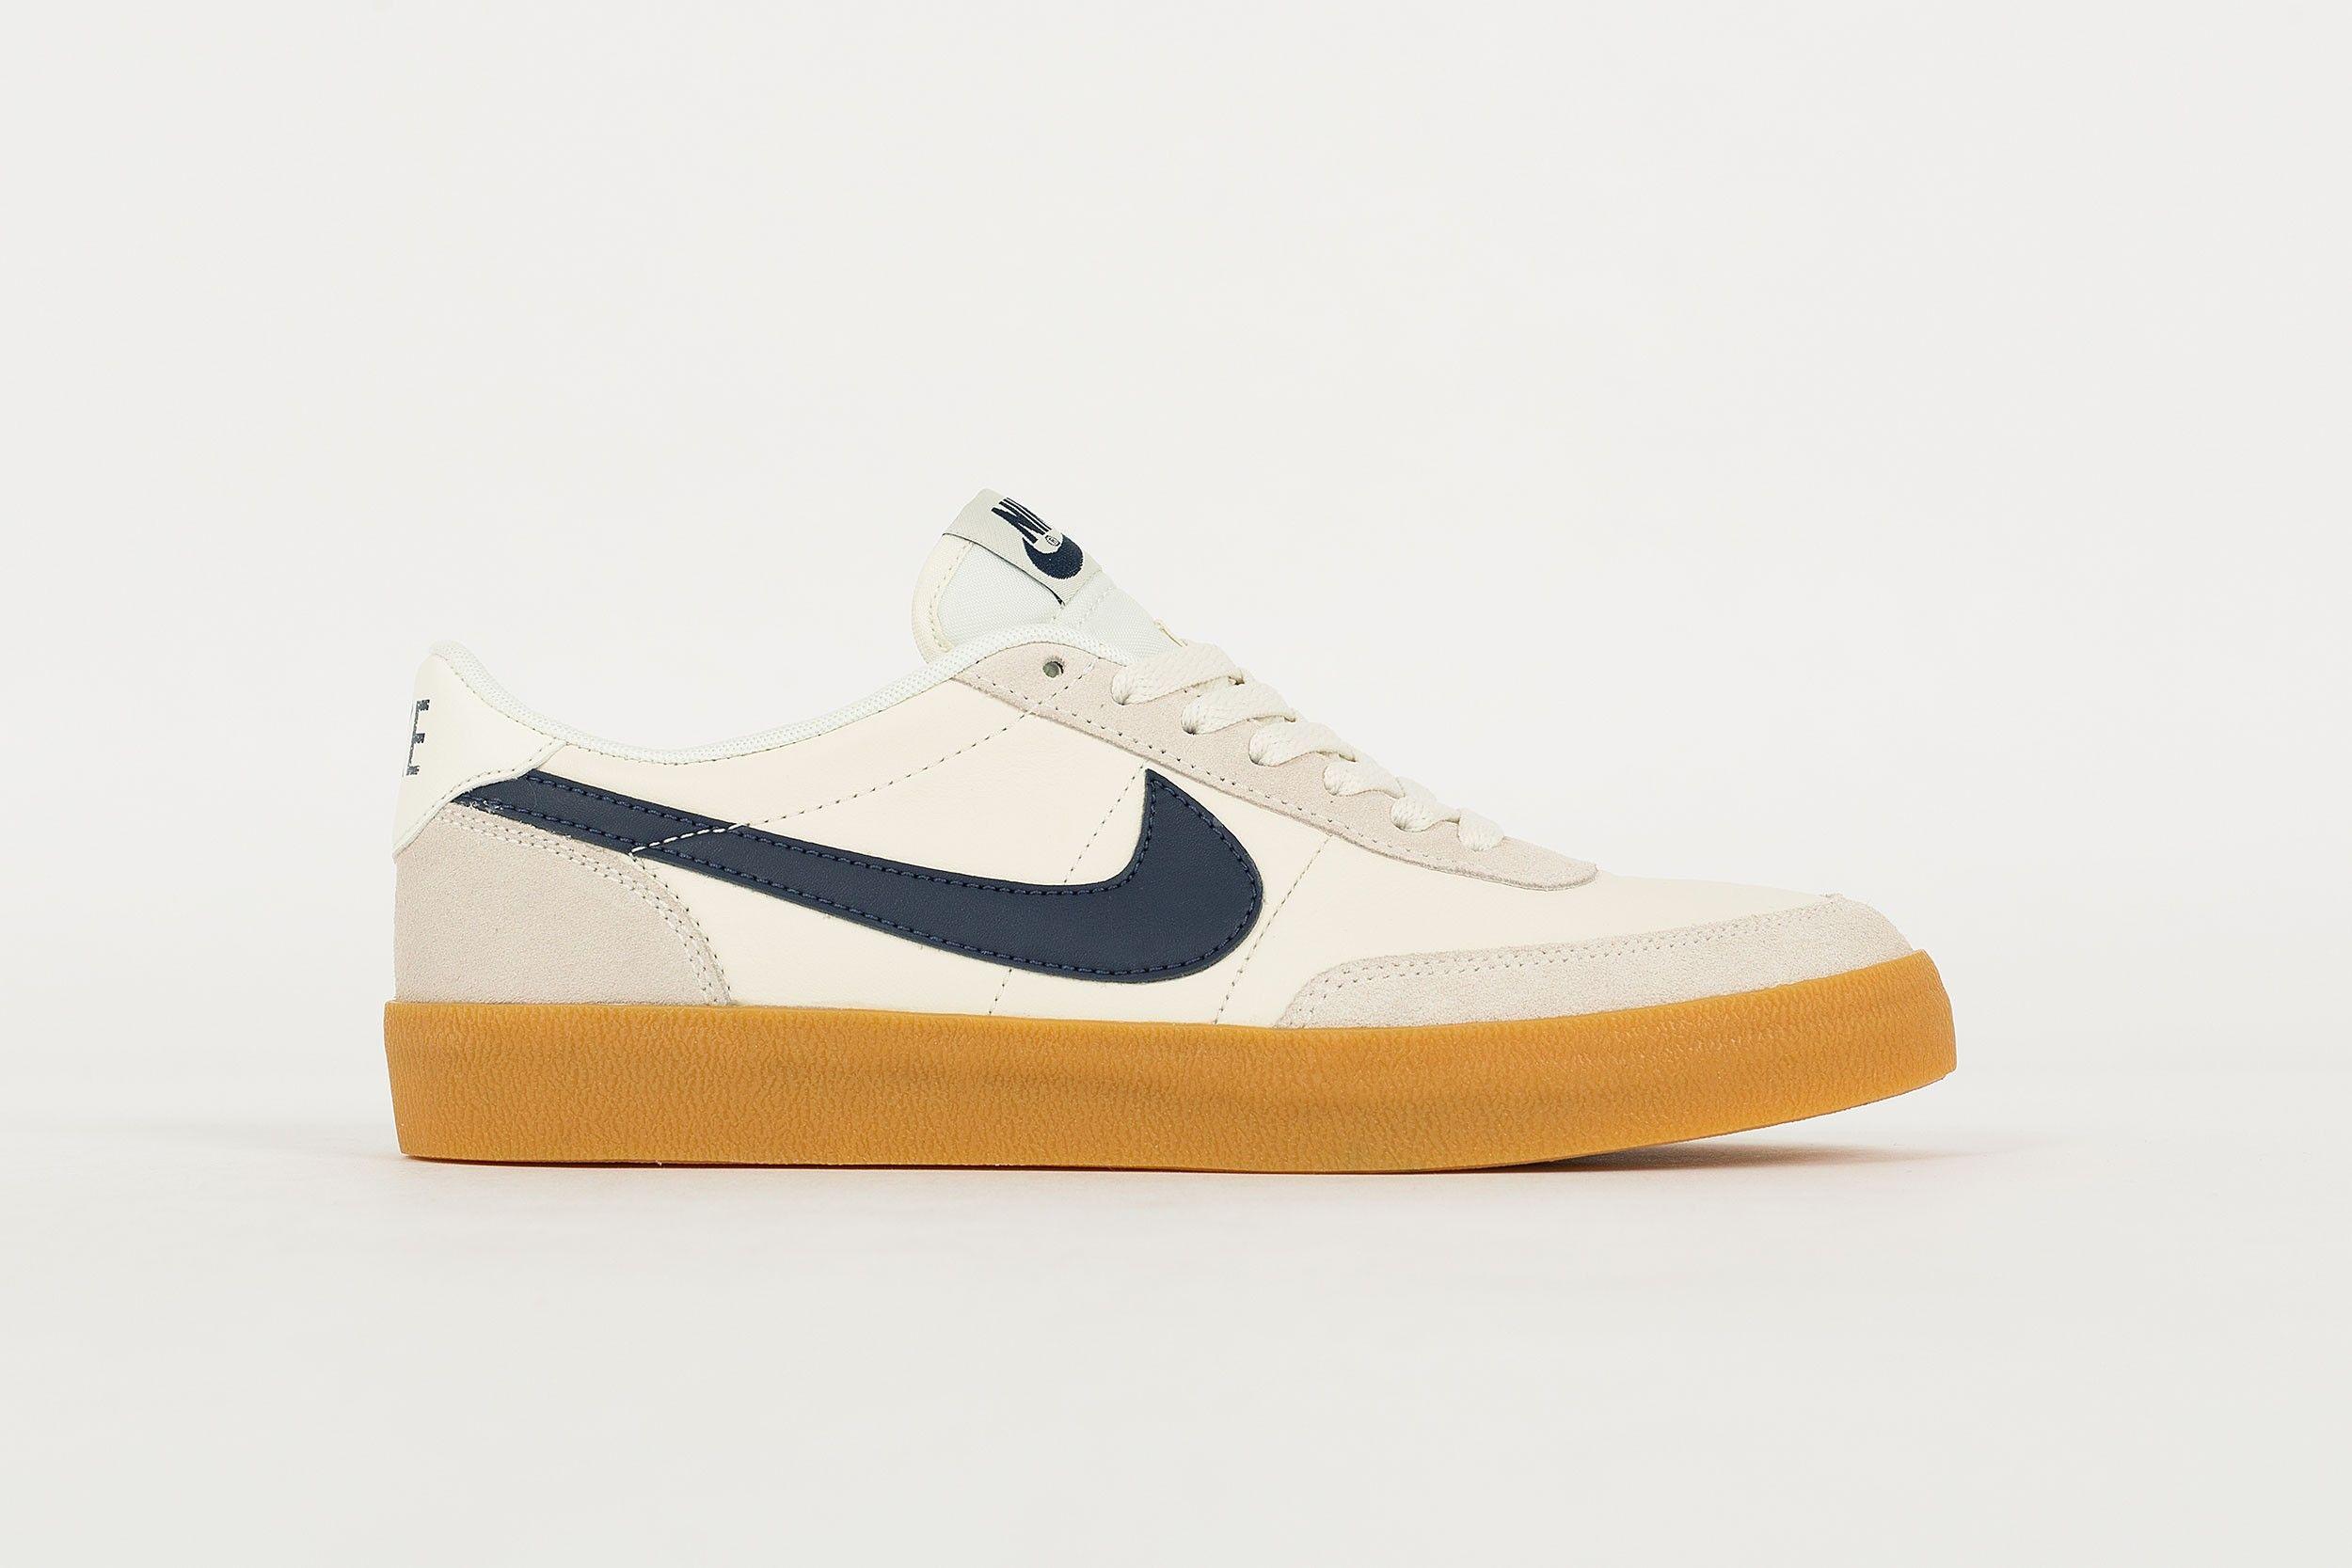 b16692f0e73 Nike Killshot 2 - Available in the EU! via malefashionadvice on ...